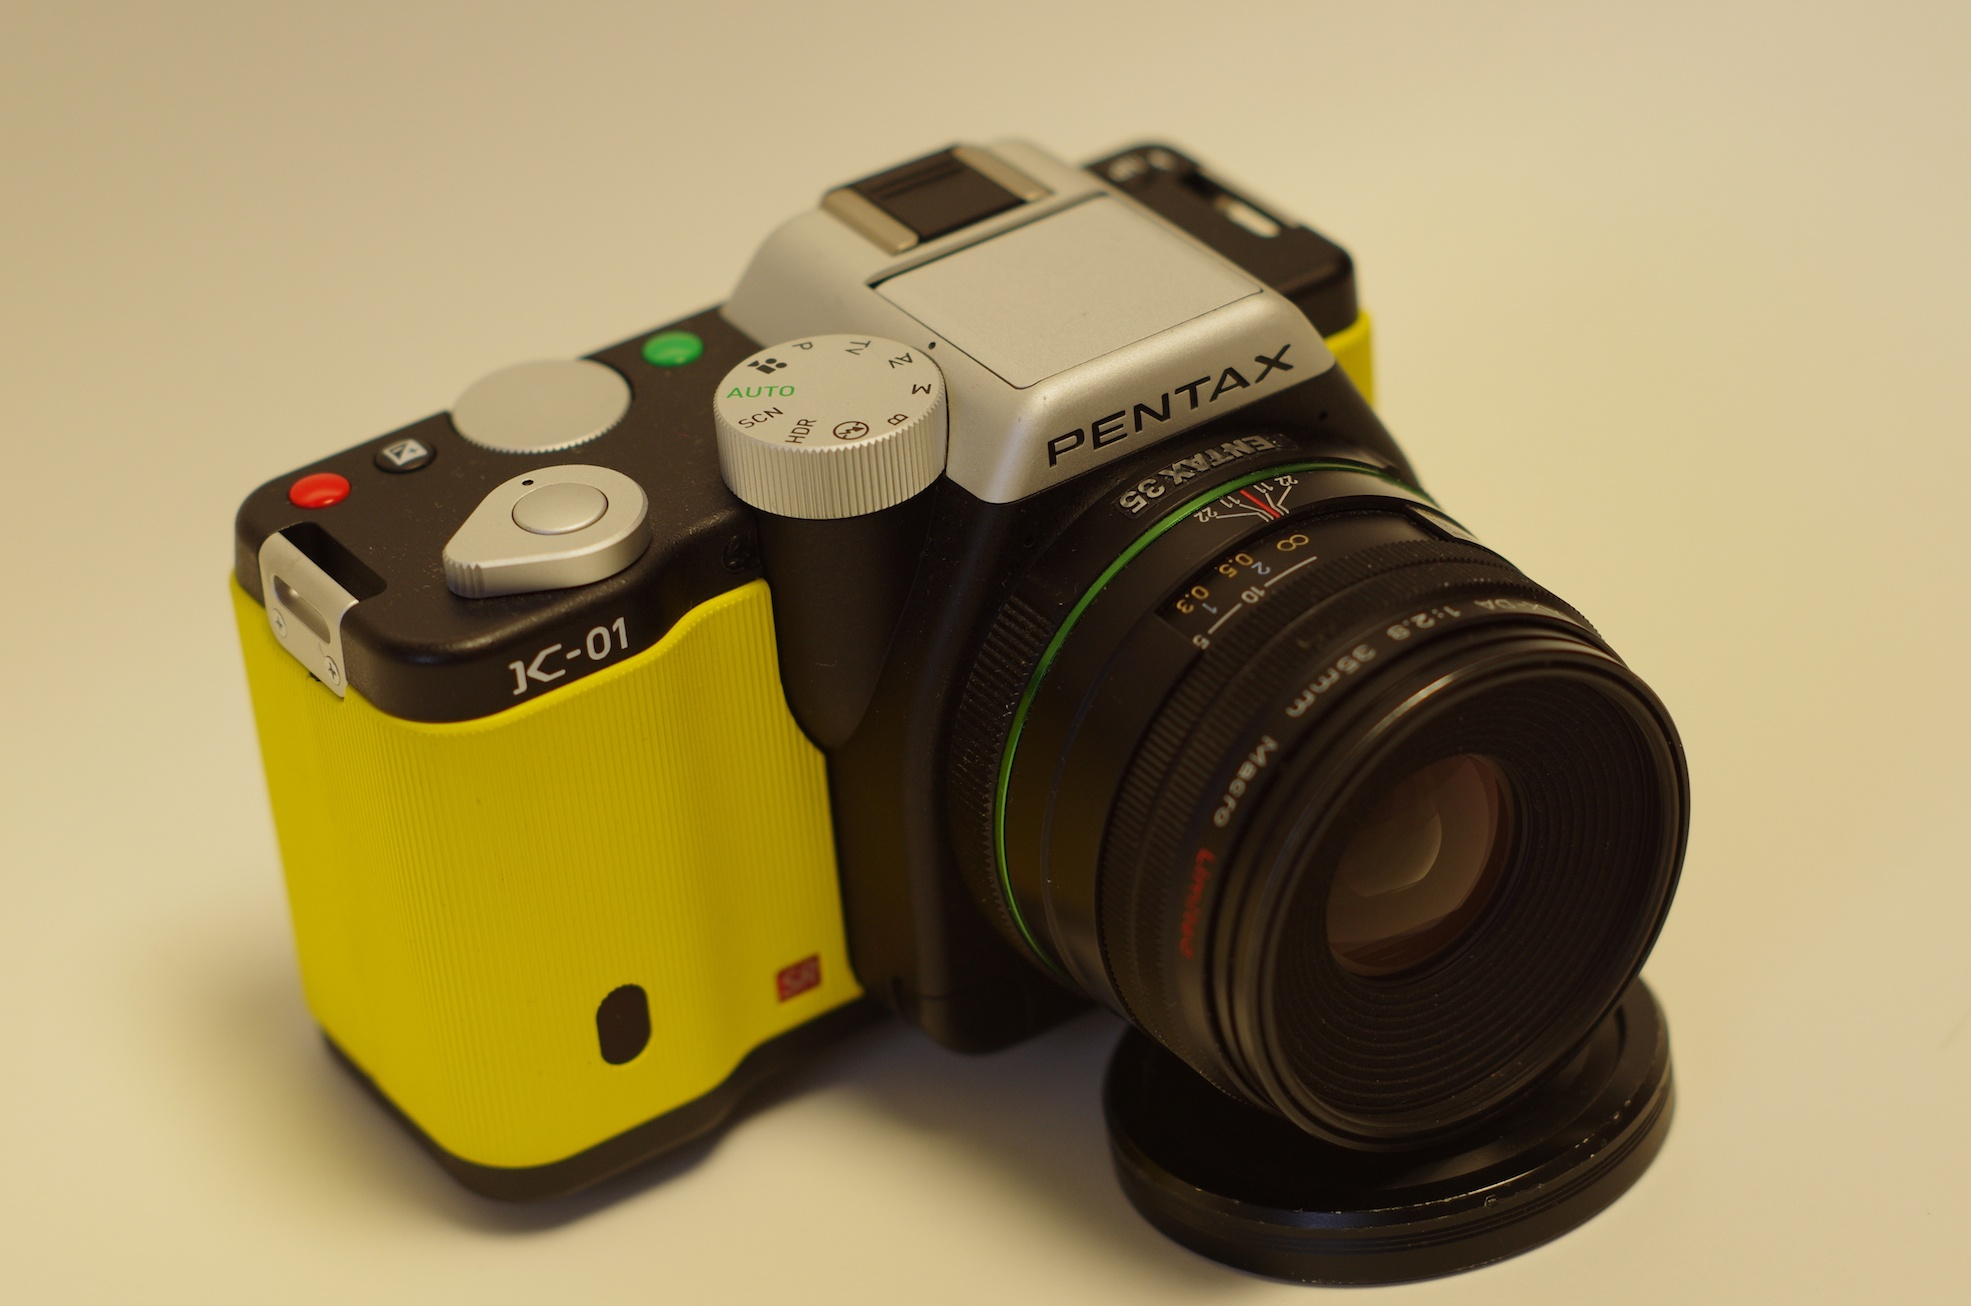 PENTAX K-5 SMC TAKUMAR 55mm f1.8 ISO400 1/30